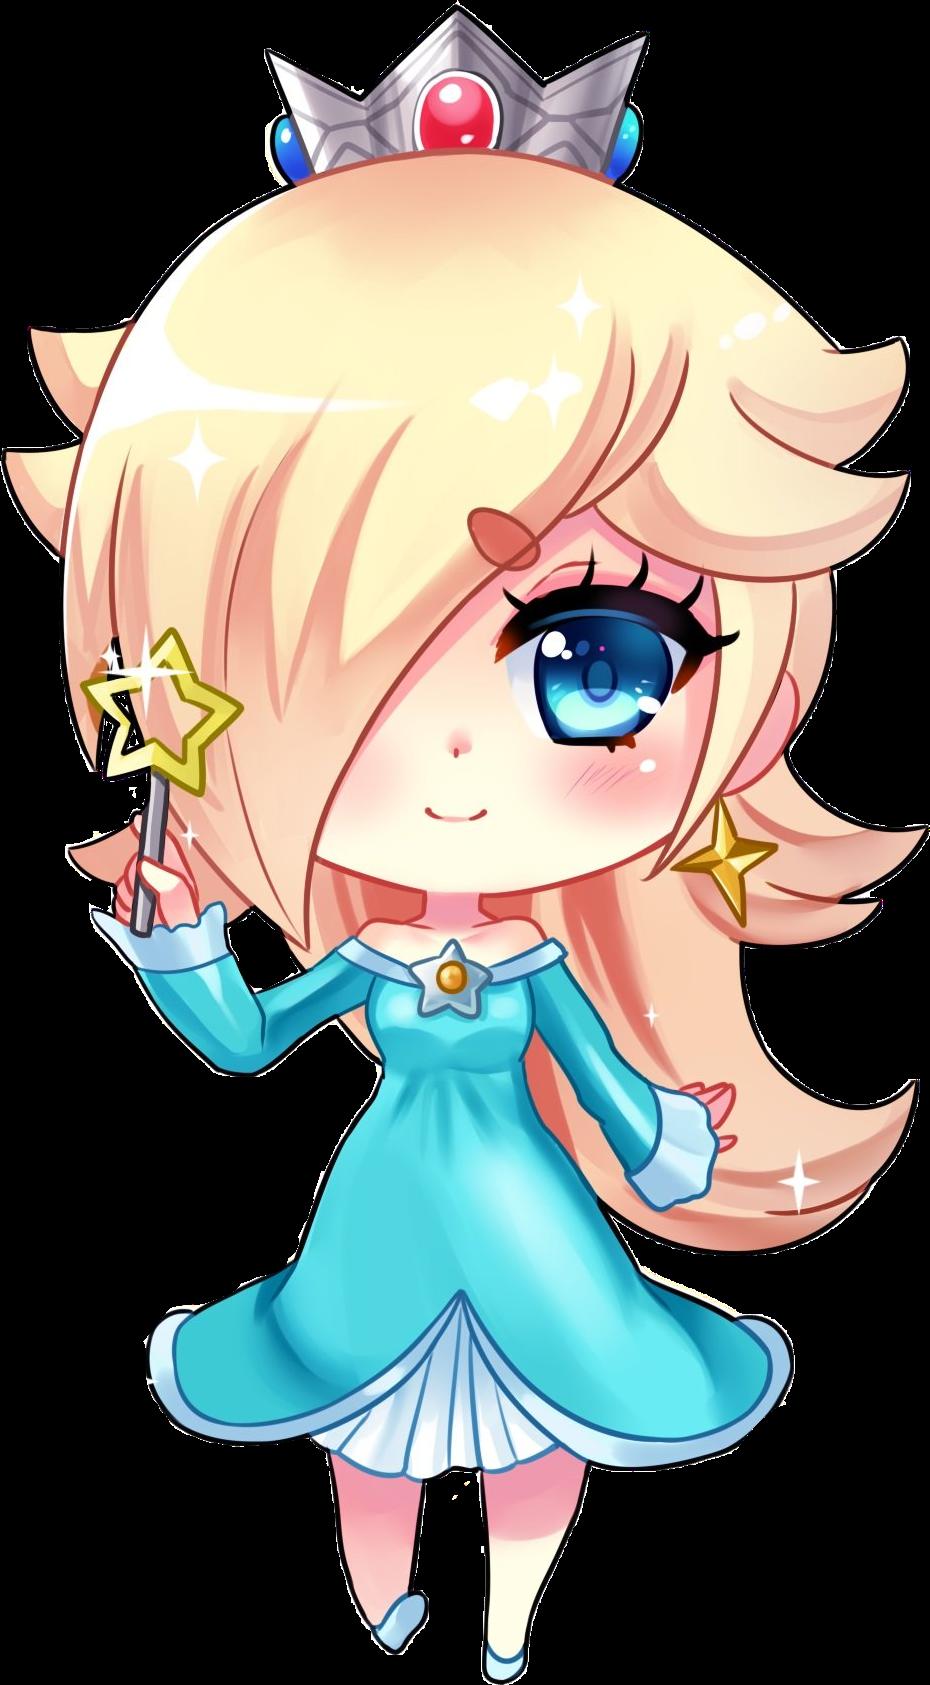 Fille Kawaii Blonde Chibi Mario Princess Rosalina Harmo